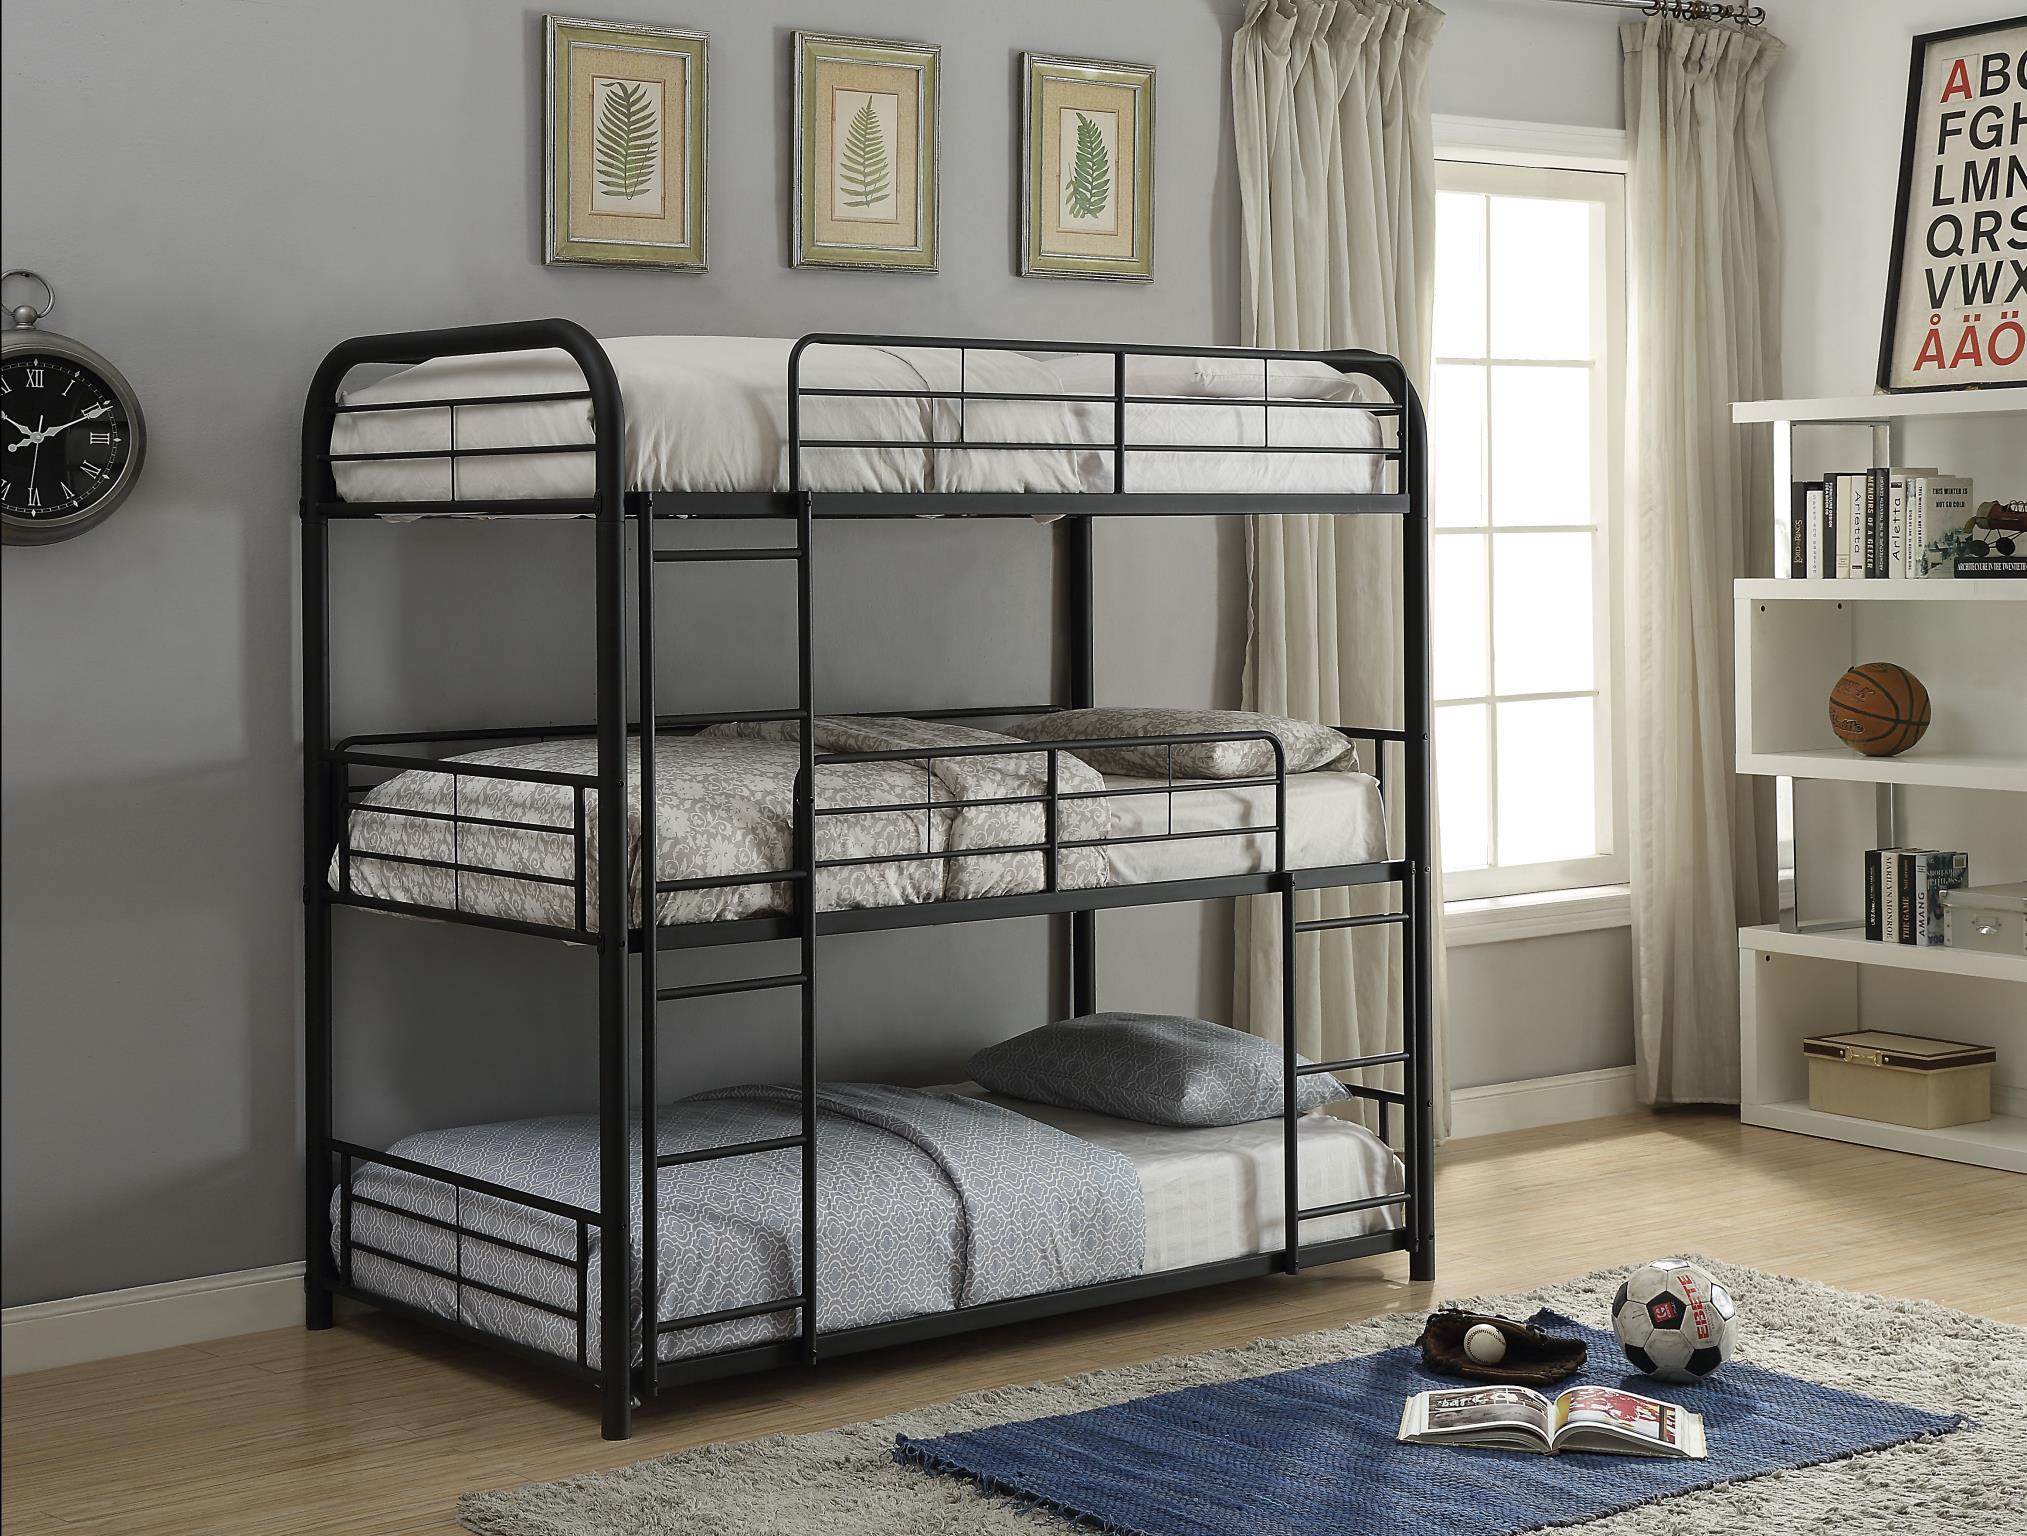 Three Layer Bunk Bed